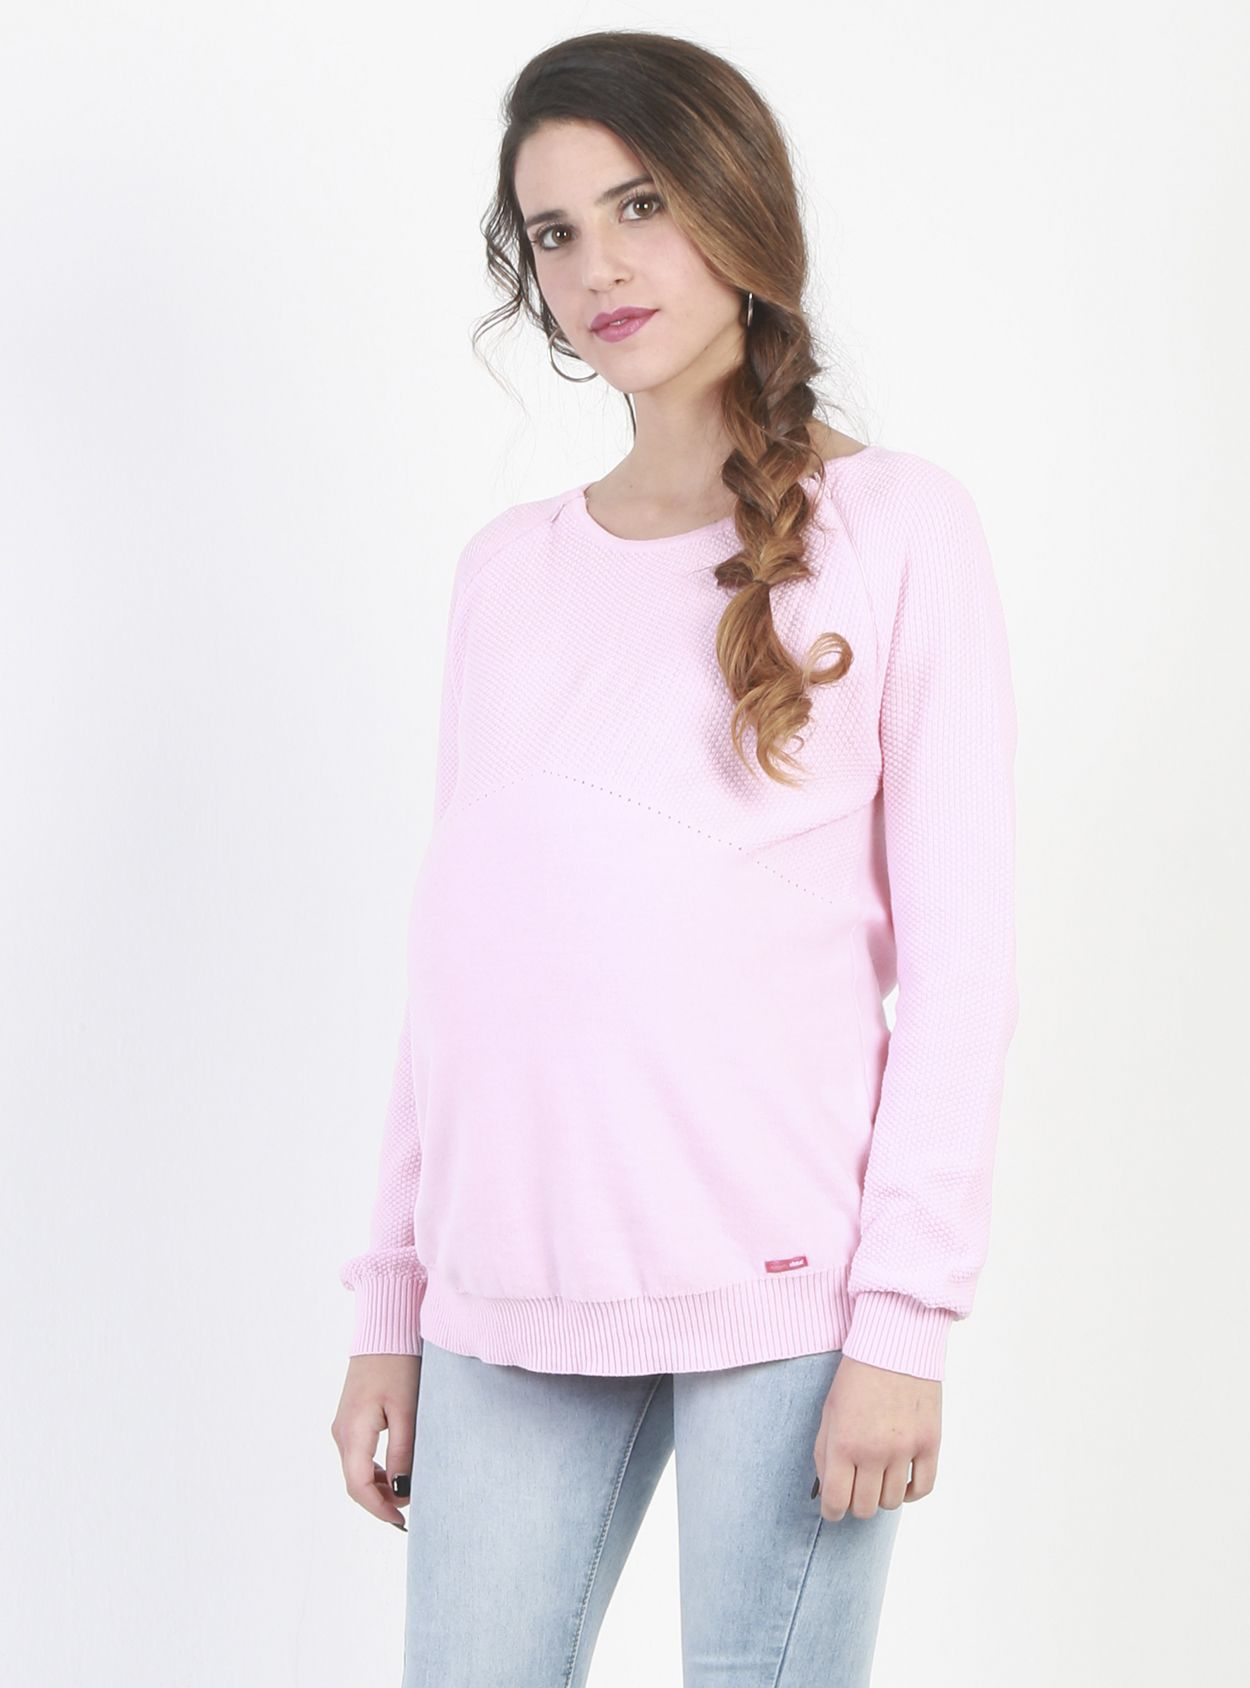 8f8dfc15cf5eb Lightweight, Pink Nursing and Maternity Jumper | Maternity knitwear ...